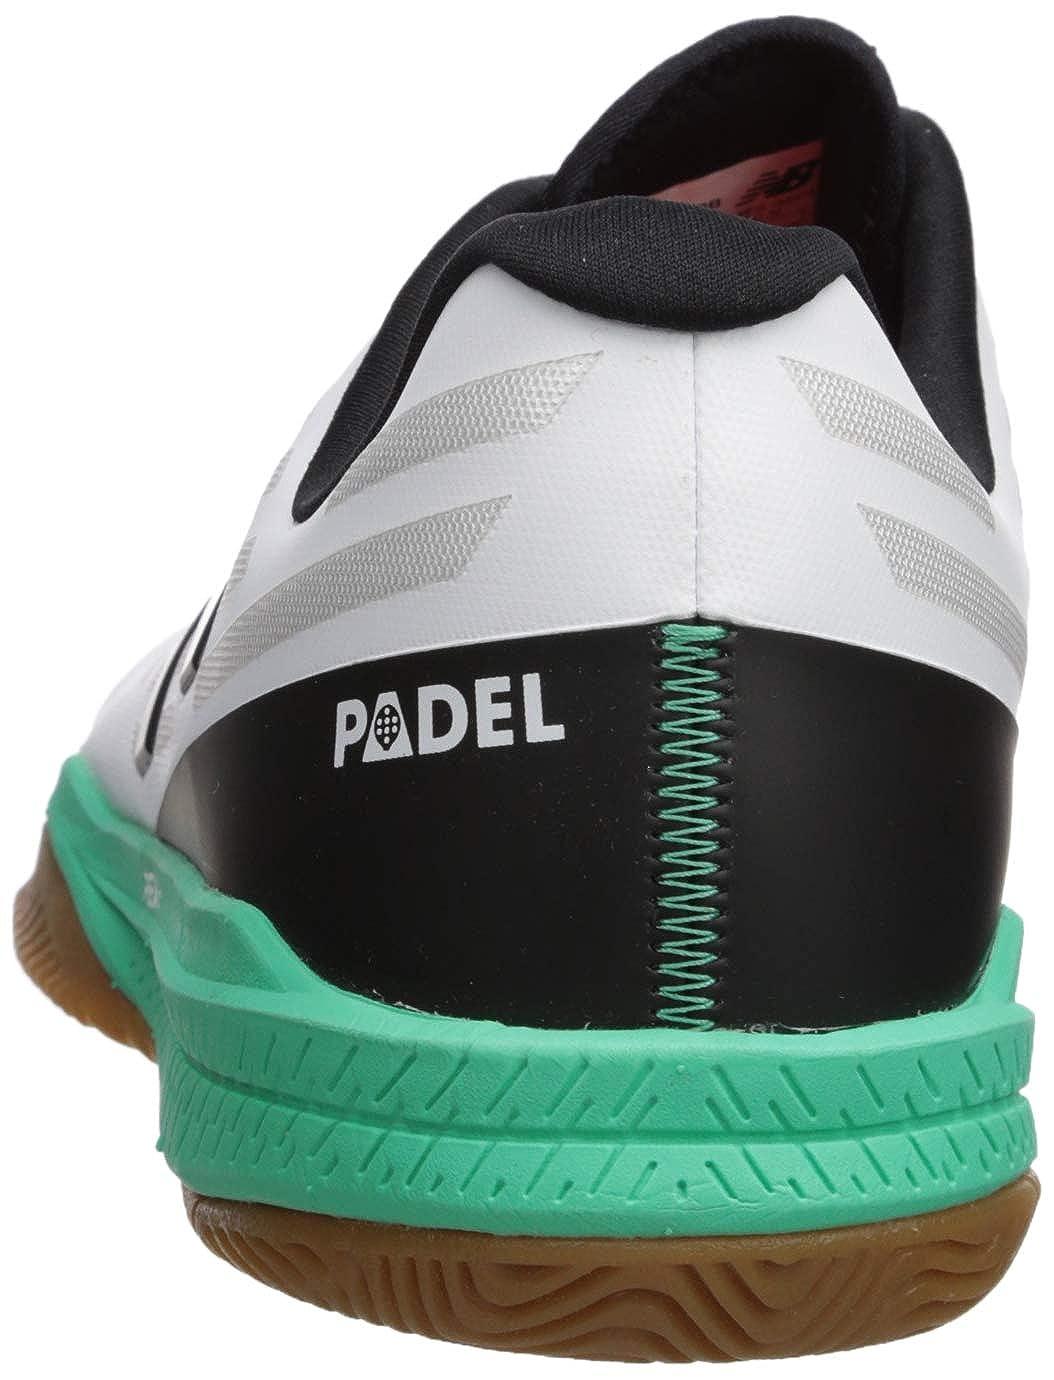 New Balance Mens 796v1 Hard Court Tennis Shoe